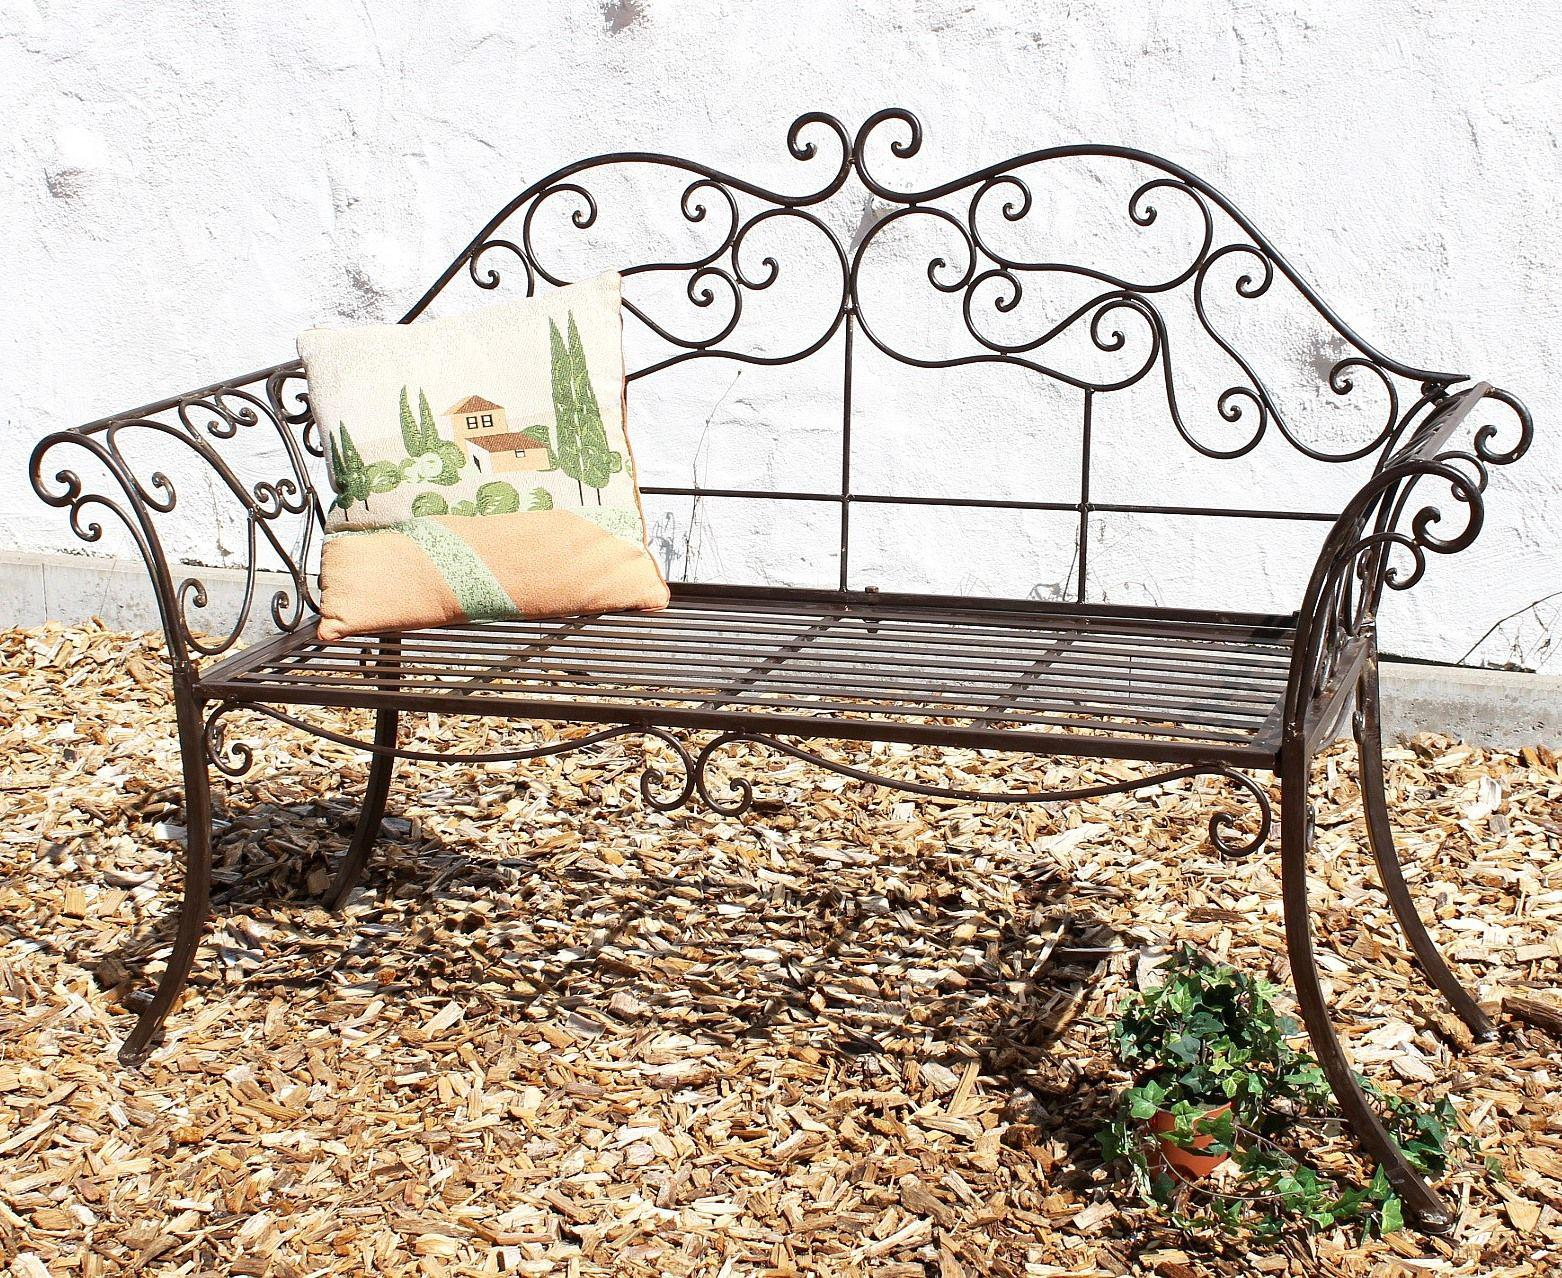 gartenbank braun bank schmiedeeisen 146 cm metall 111183 2 sitzbank parkbank ebay. Black Bedroom Furniture Sets. Home Design Ideas